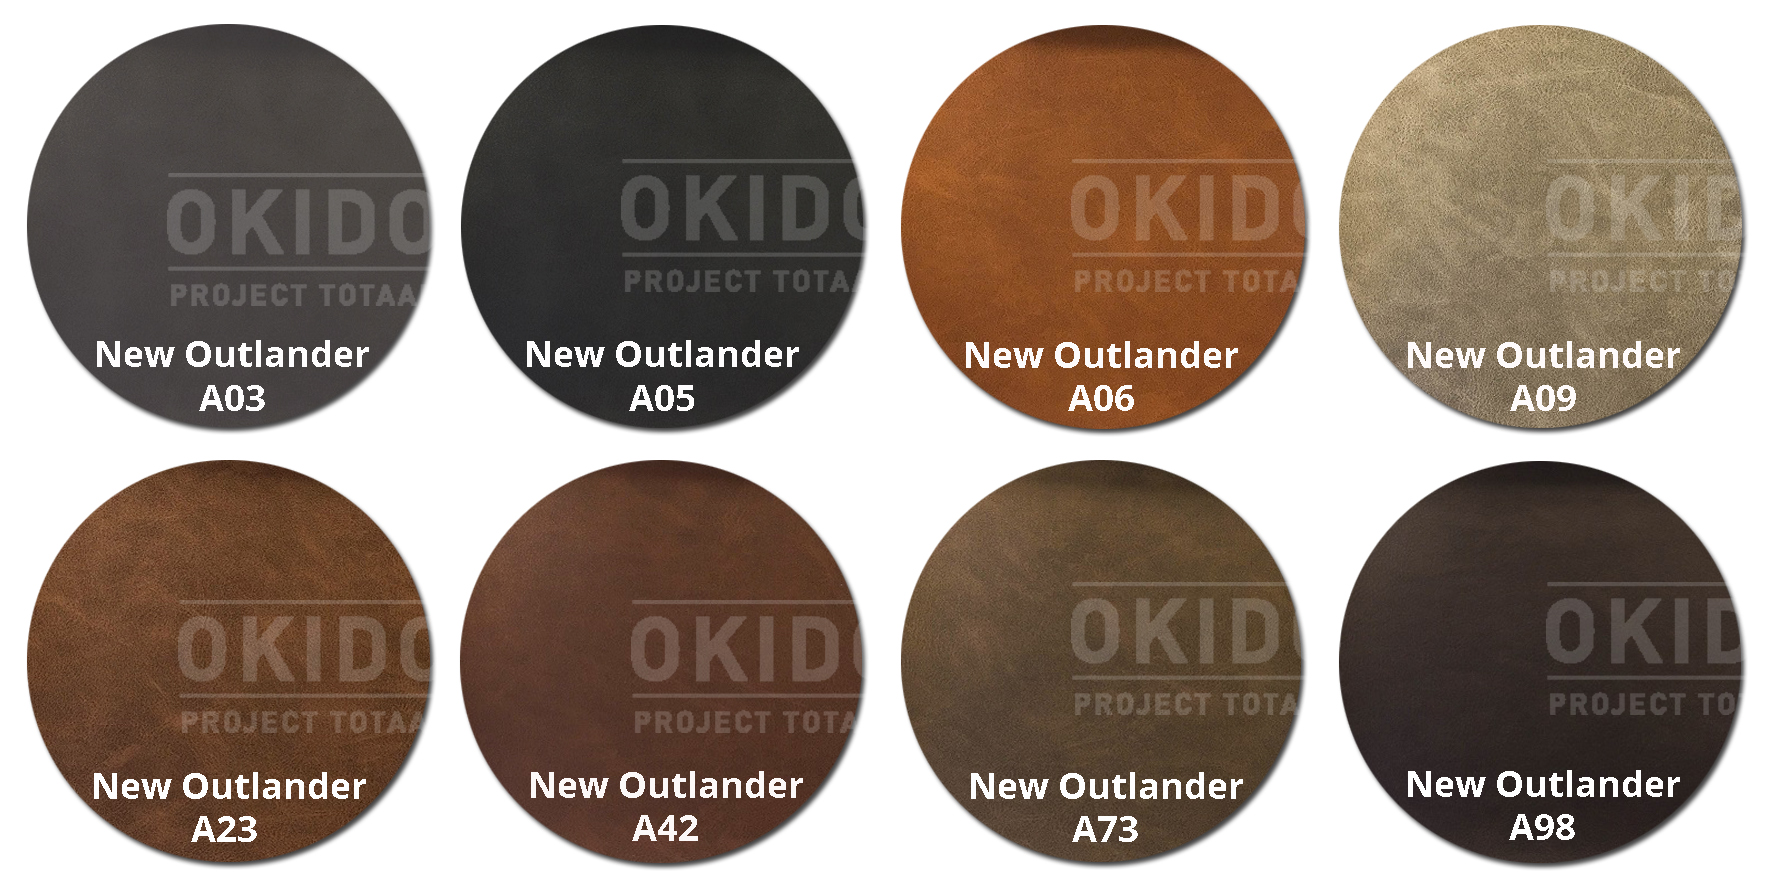 New Outlander kleurrondjes met logo 1 - Stoel Lisa-Sofie New Outlander